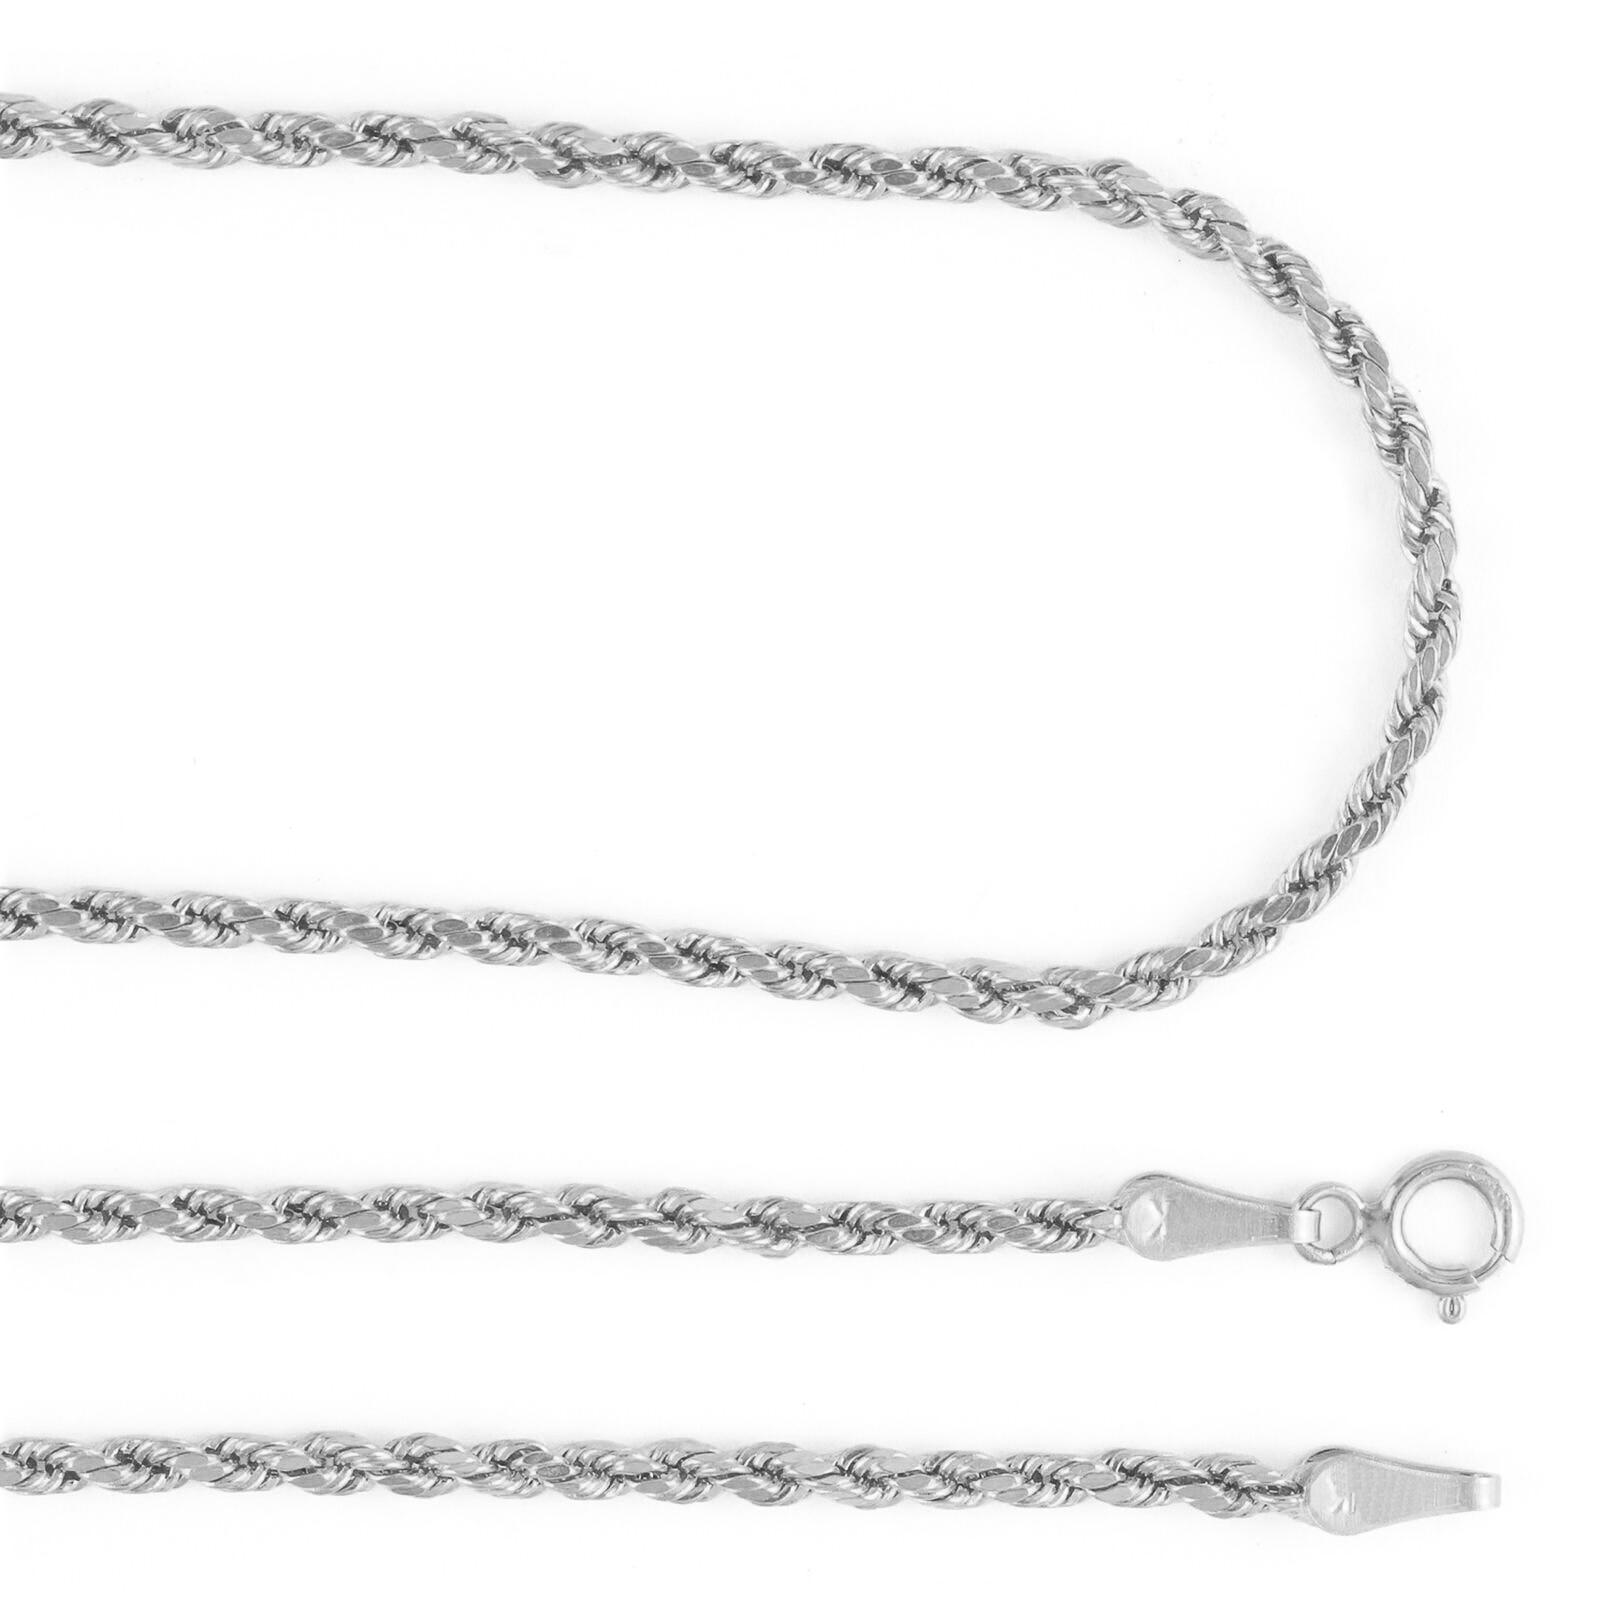 14K-White-Gold-Womens-1-5mm-Thin-Diamond-Cut-Rope-Chain-Pendant-Necklace-14-034-26-034 thumbnail 12